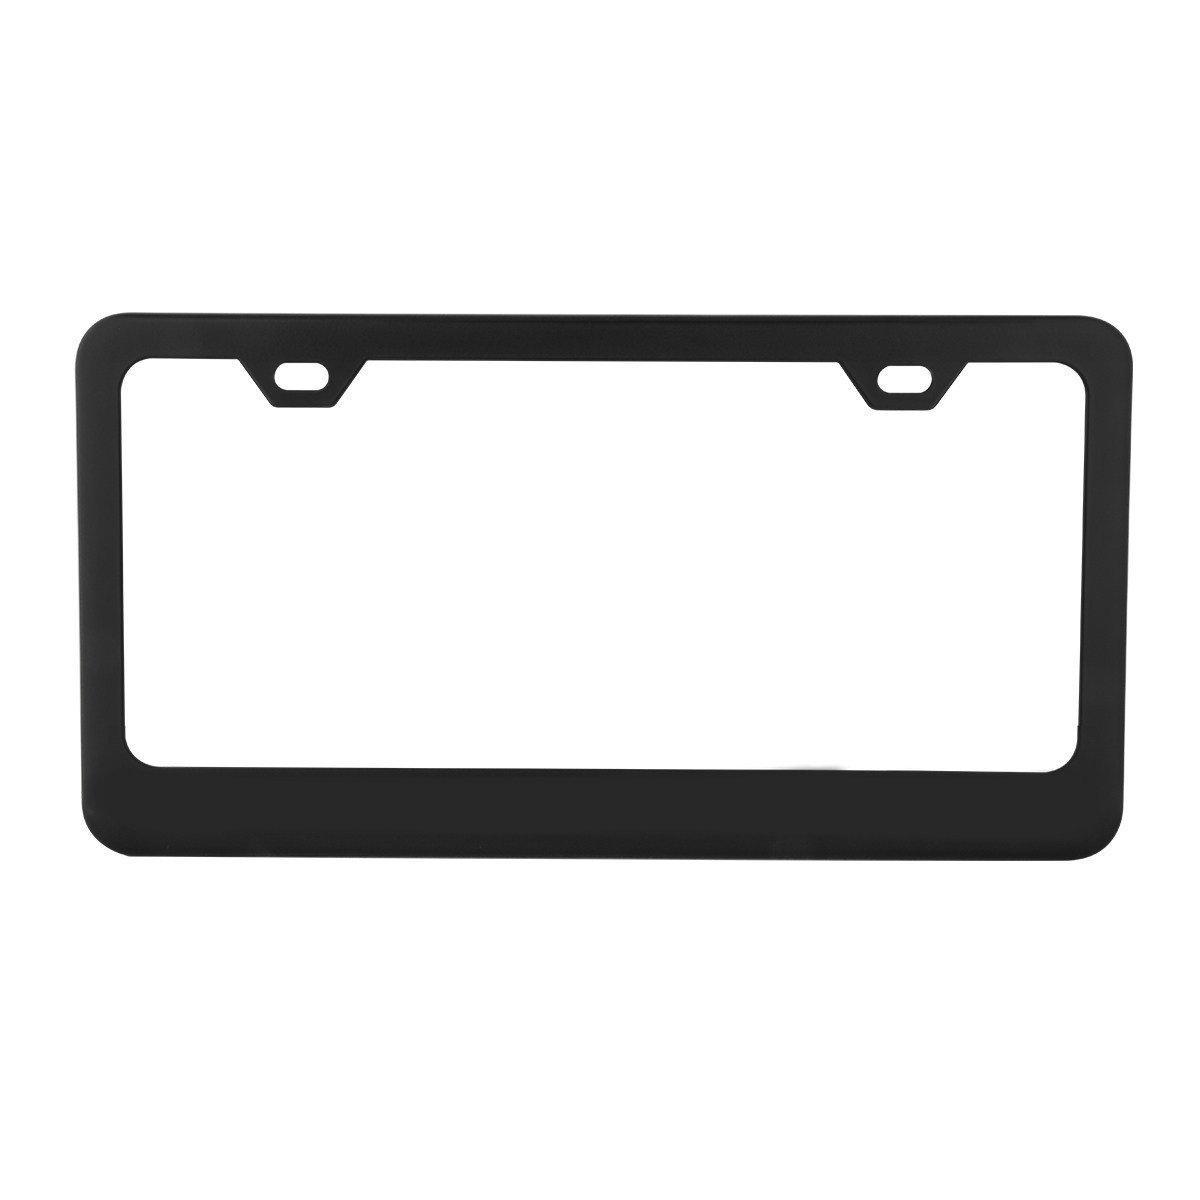 Semi Gloss Black Tag Frame